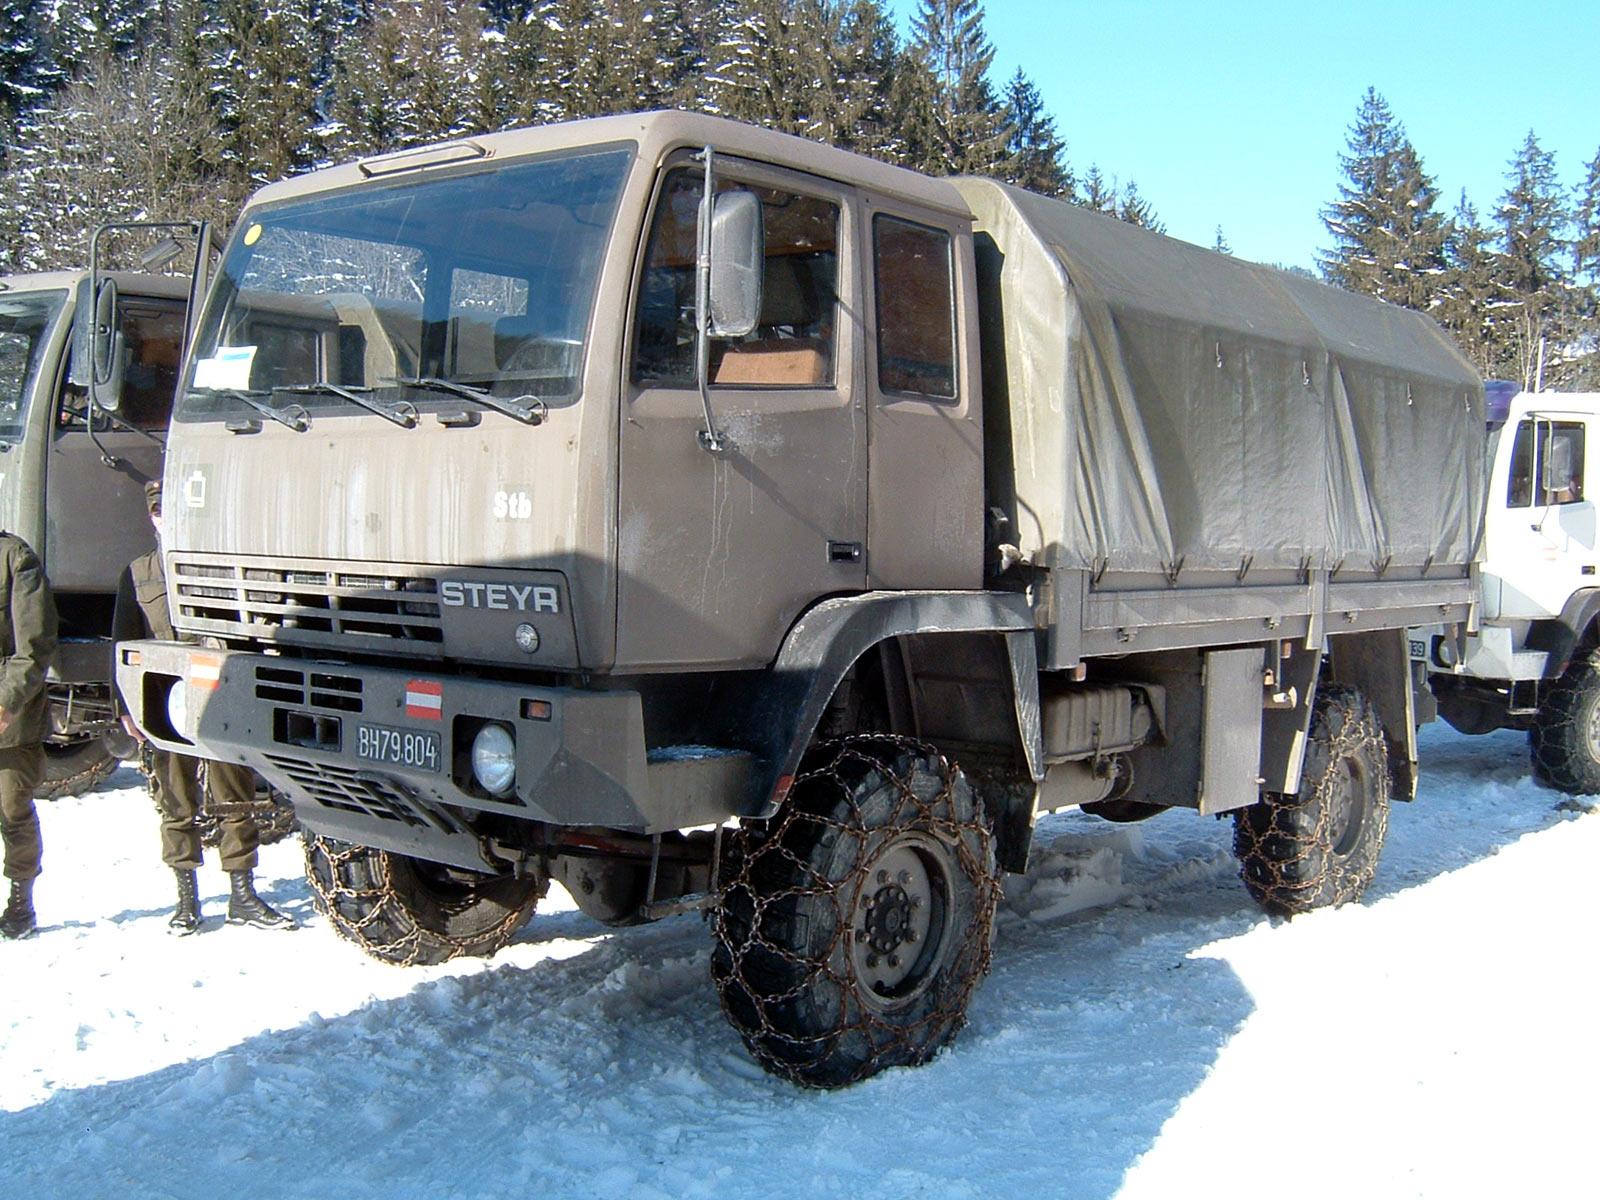 saurer truck bus Steyr_12M18_truck_of_the_Austrian_Armed_Forces